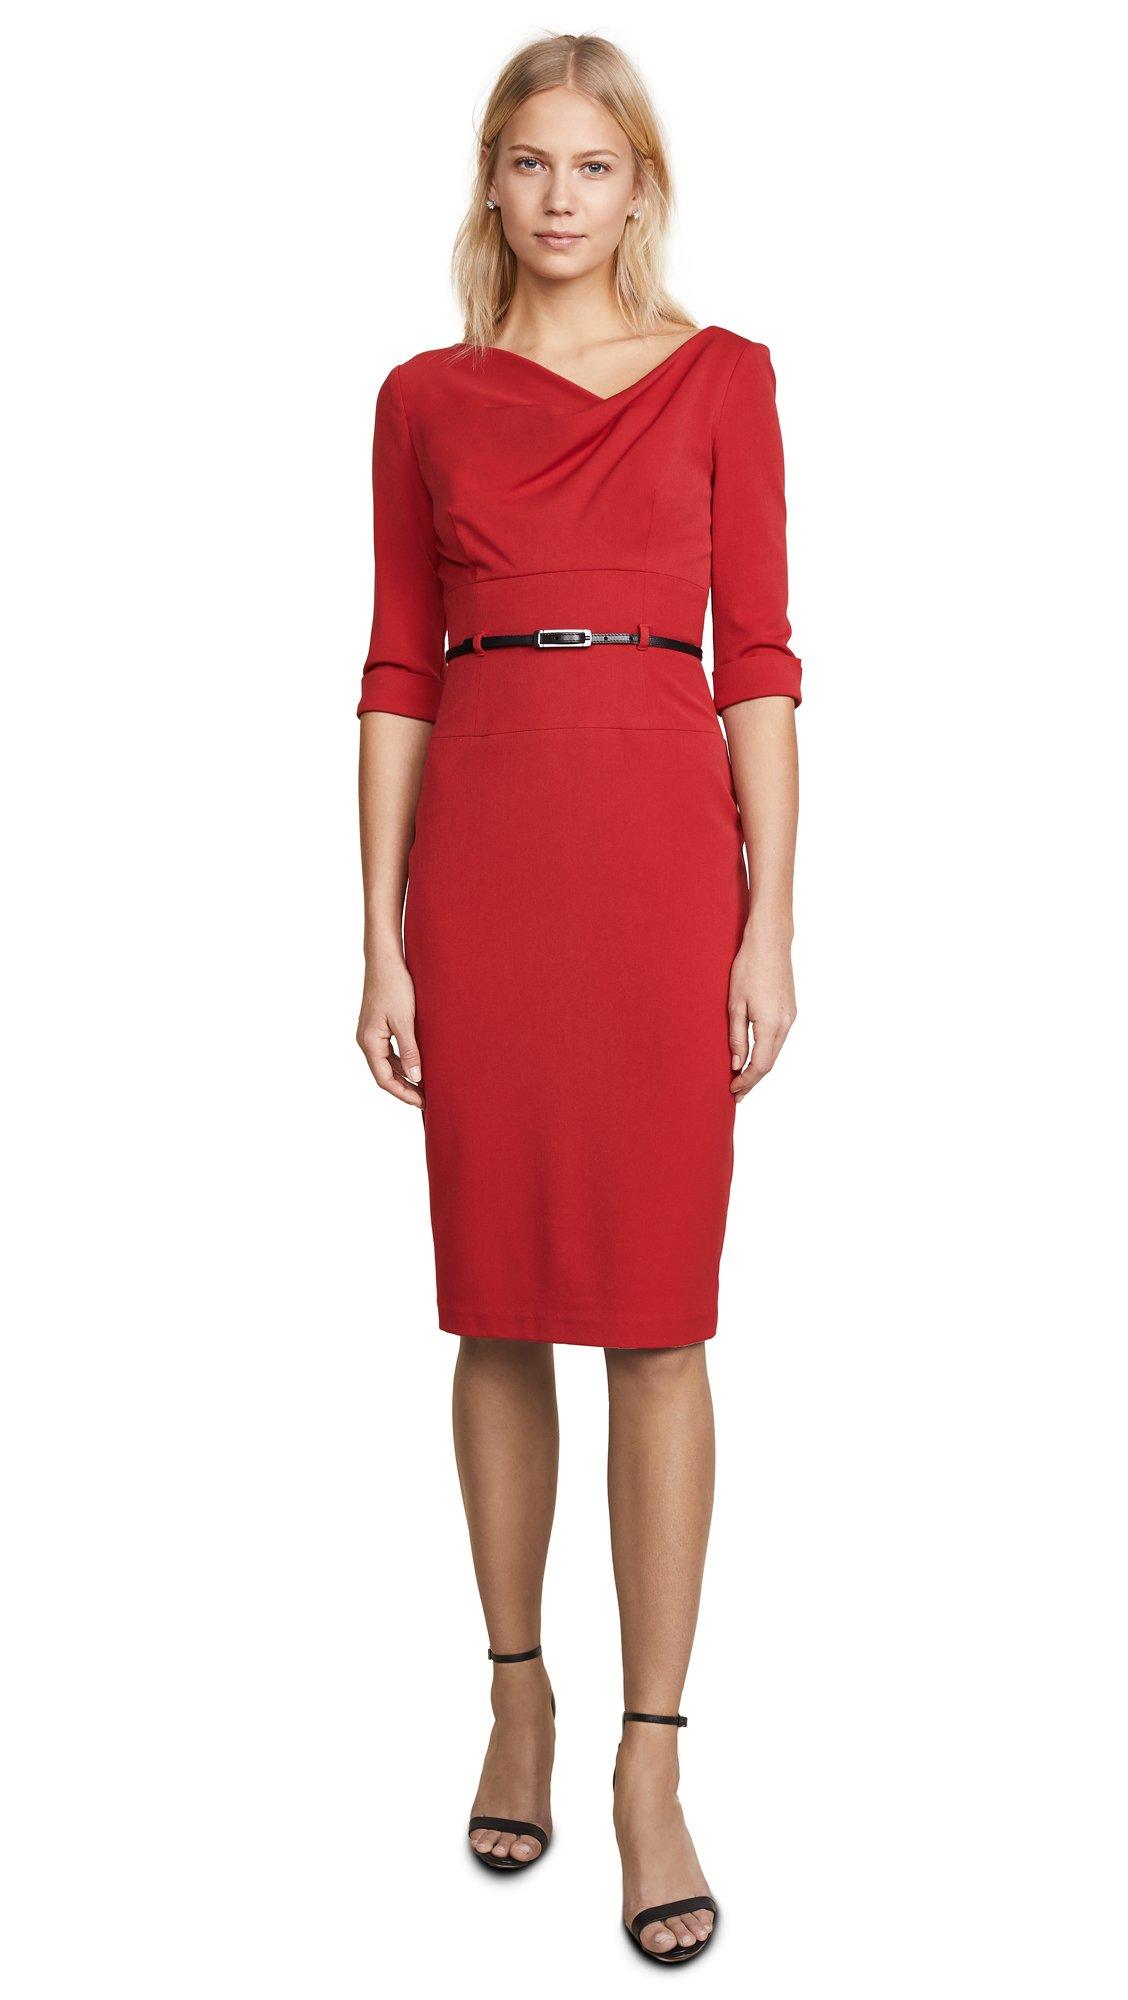 Black Halo Women's 3/4 Sleeve Jackie O Dress, Red, 6